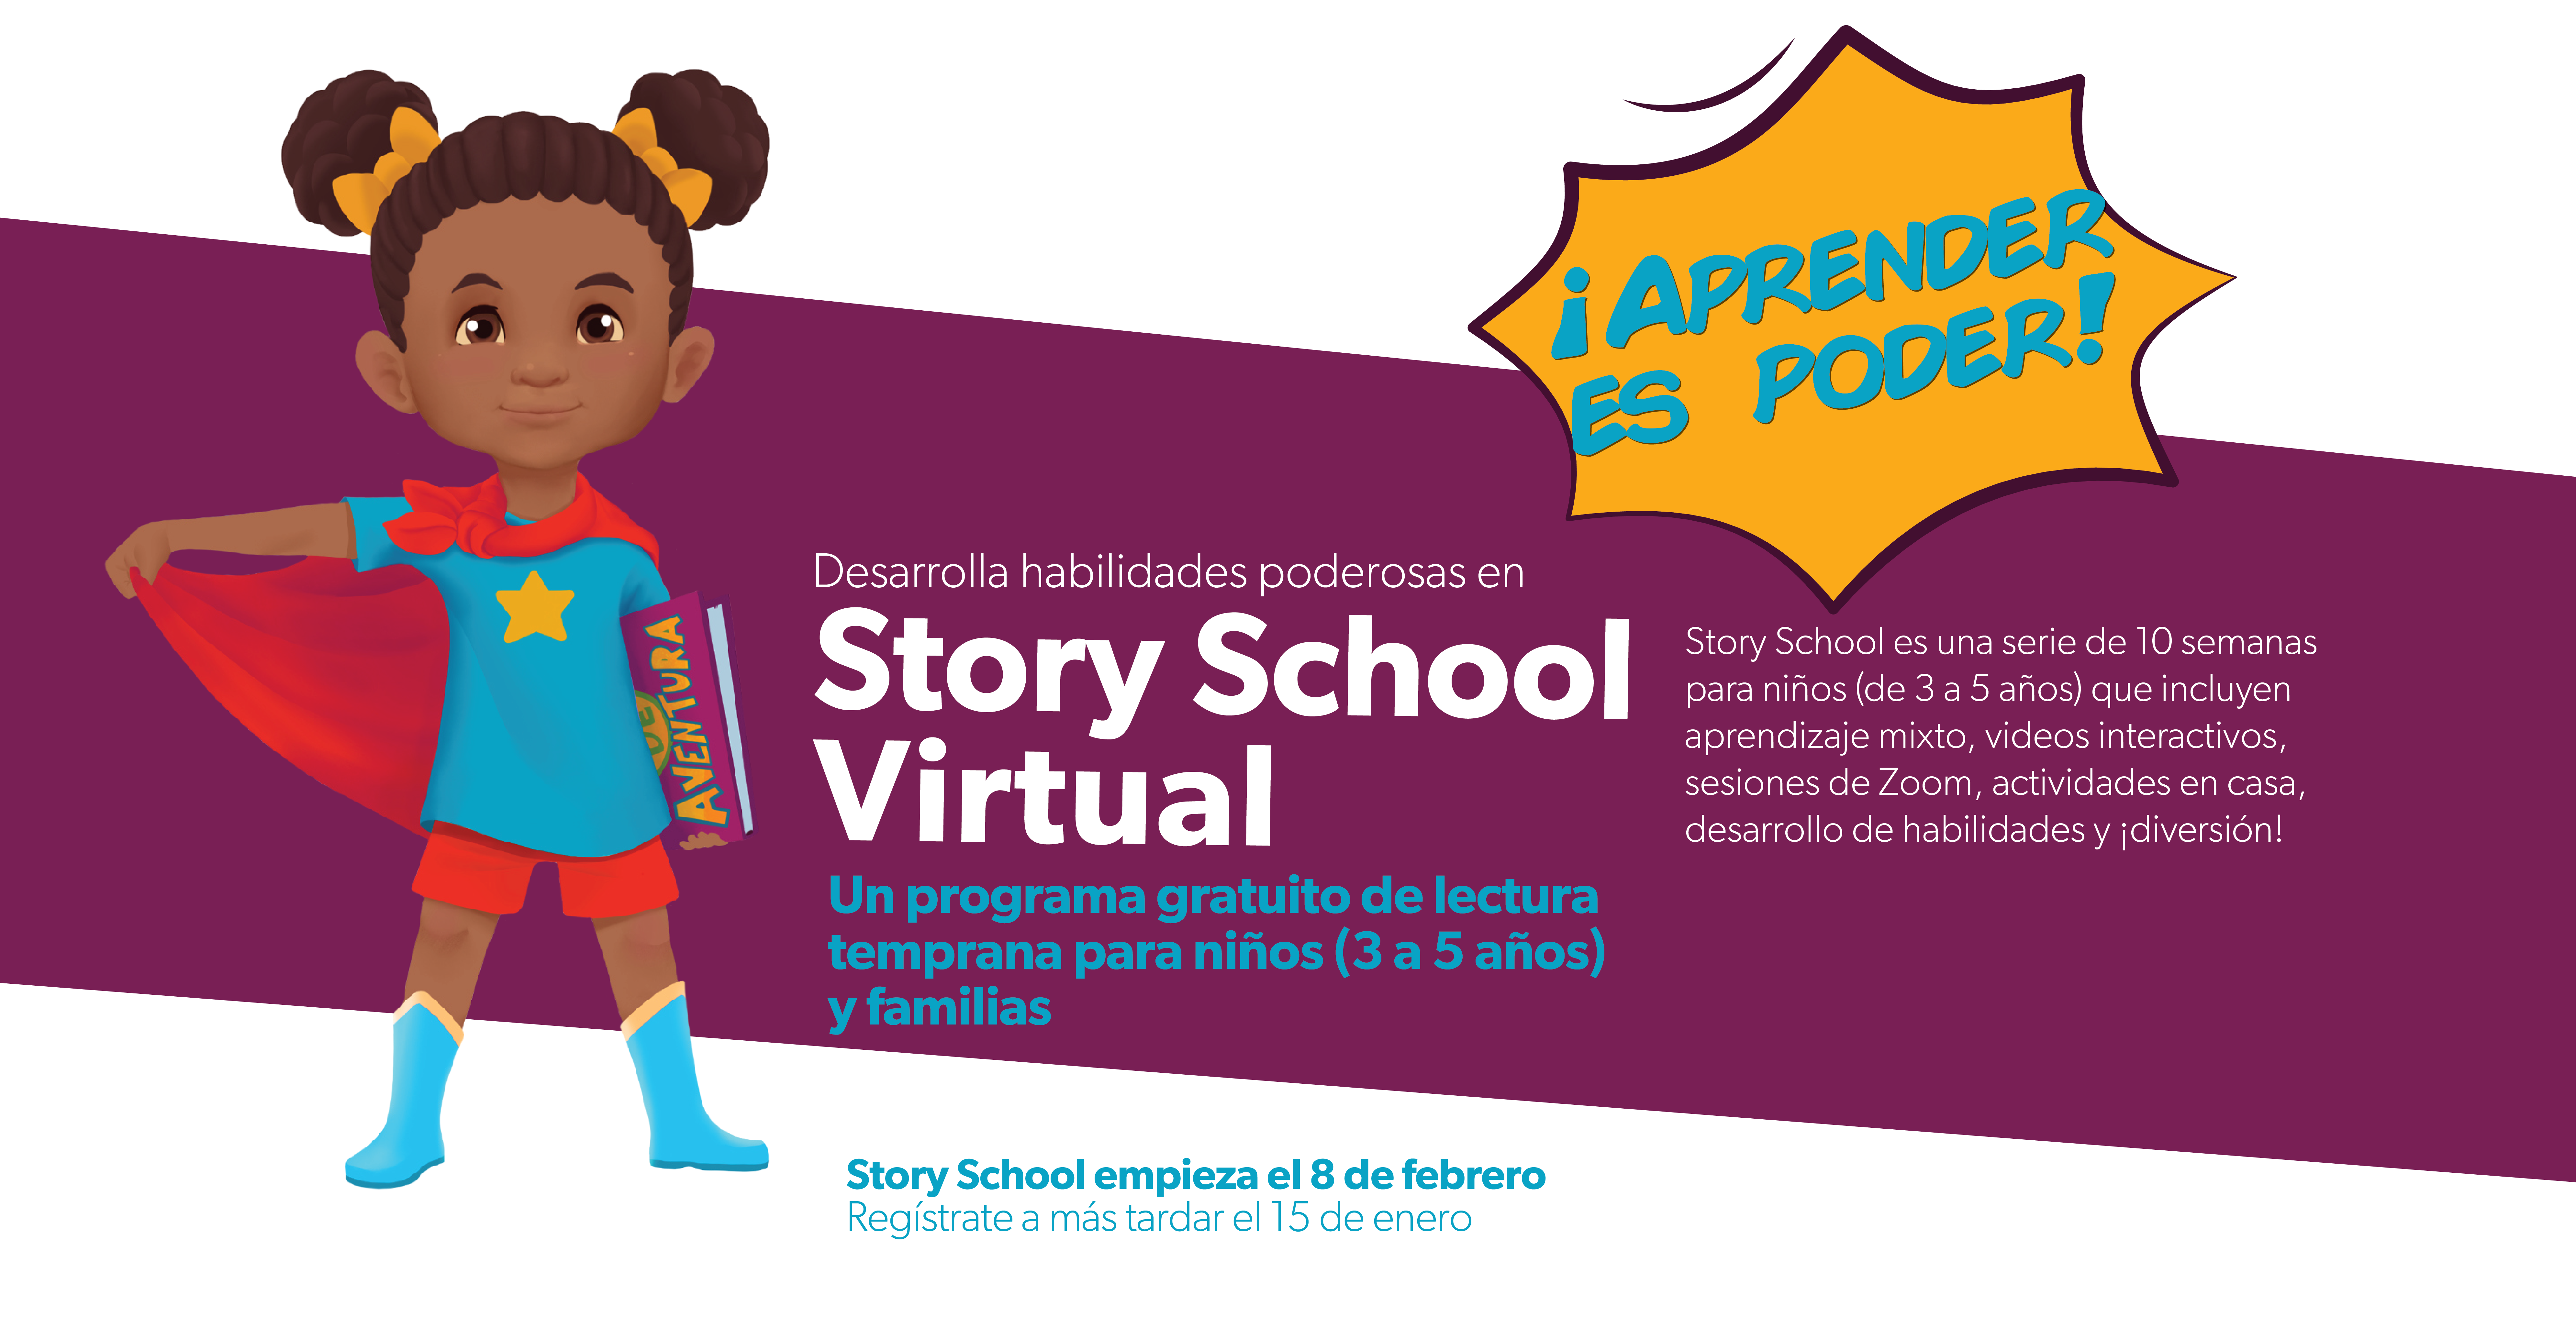 Story School Virtual